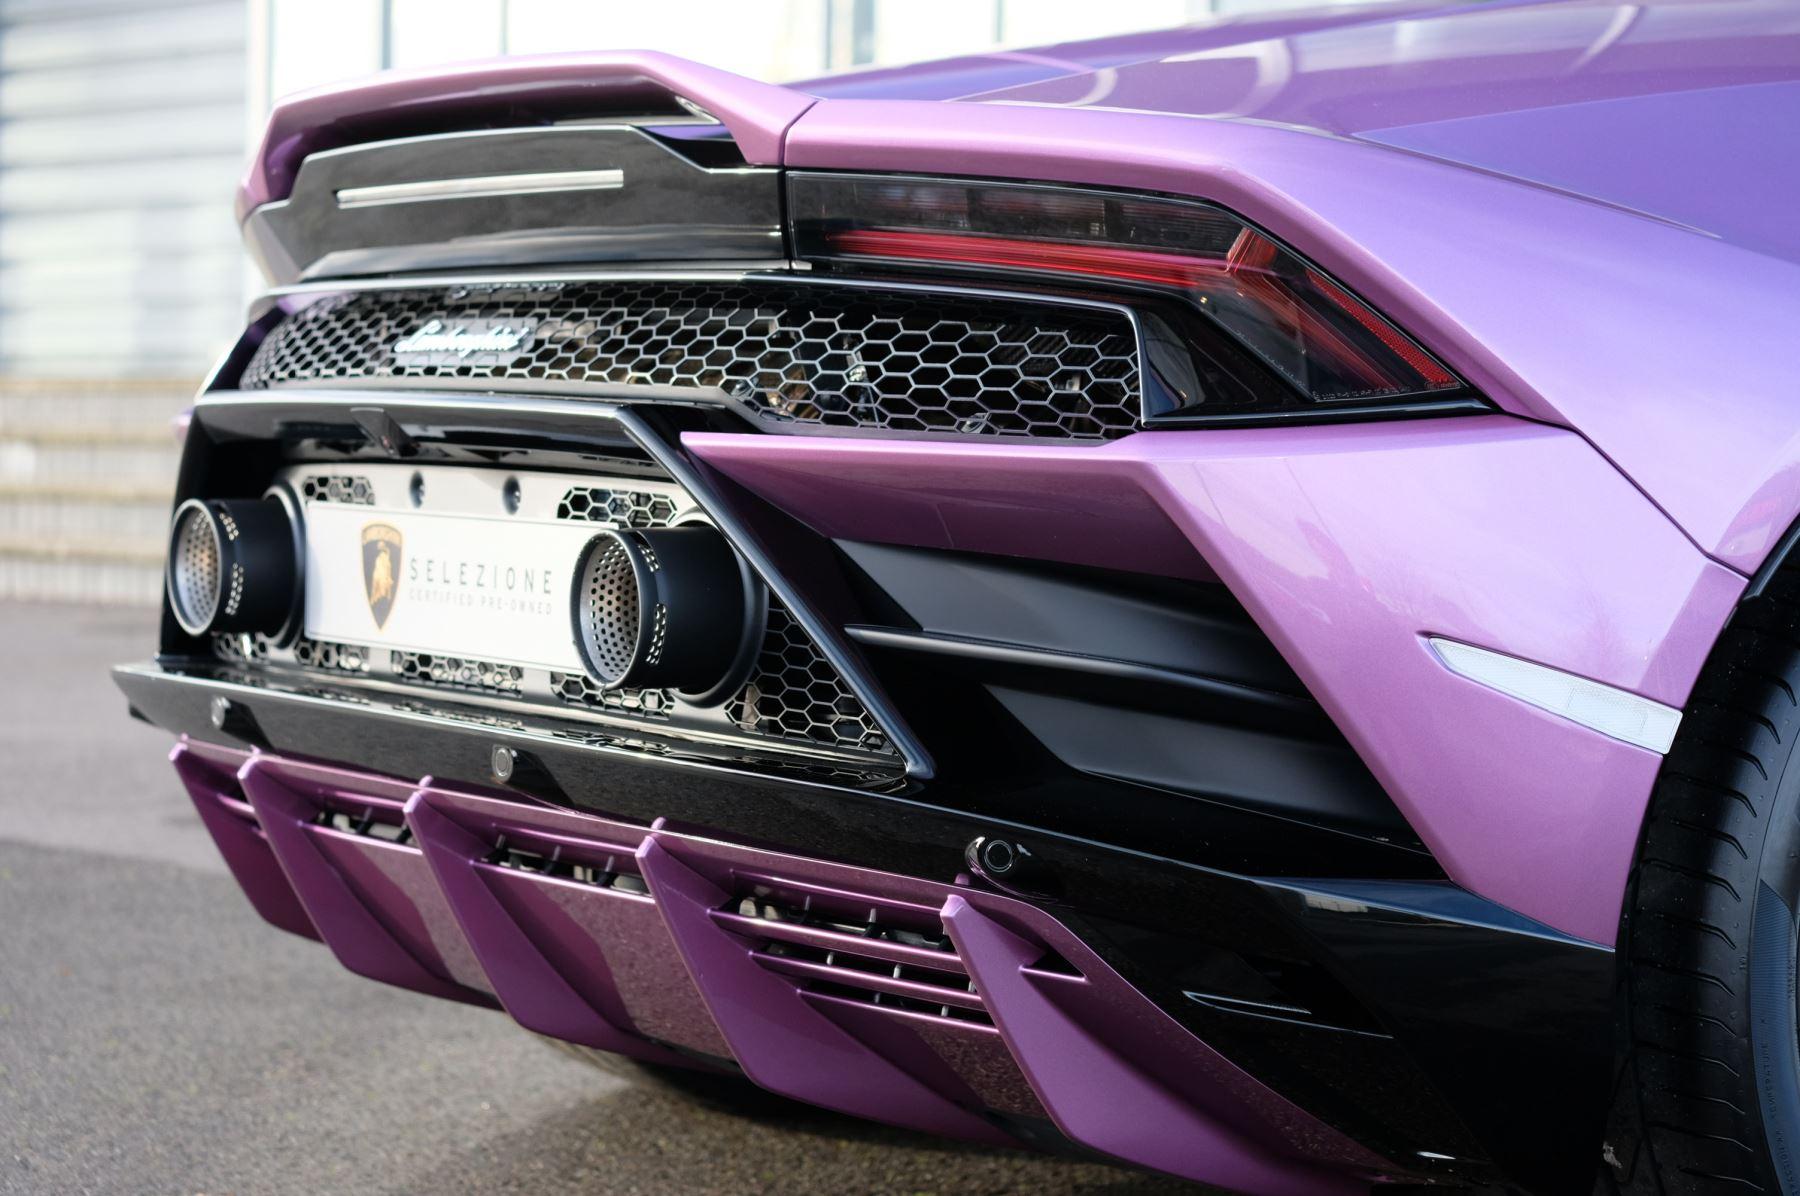 Lamborghini Huracan EVO Spyder 5.2 V10 640 2dr Auto AWD image 12